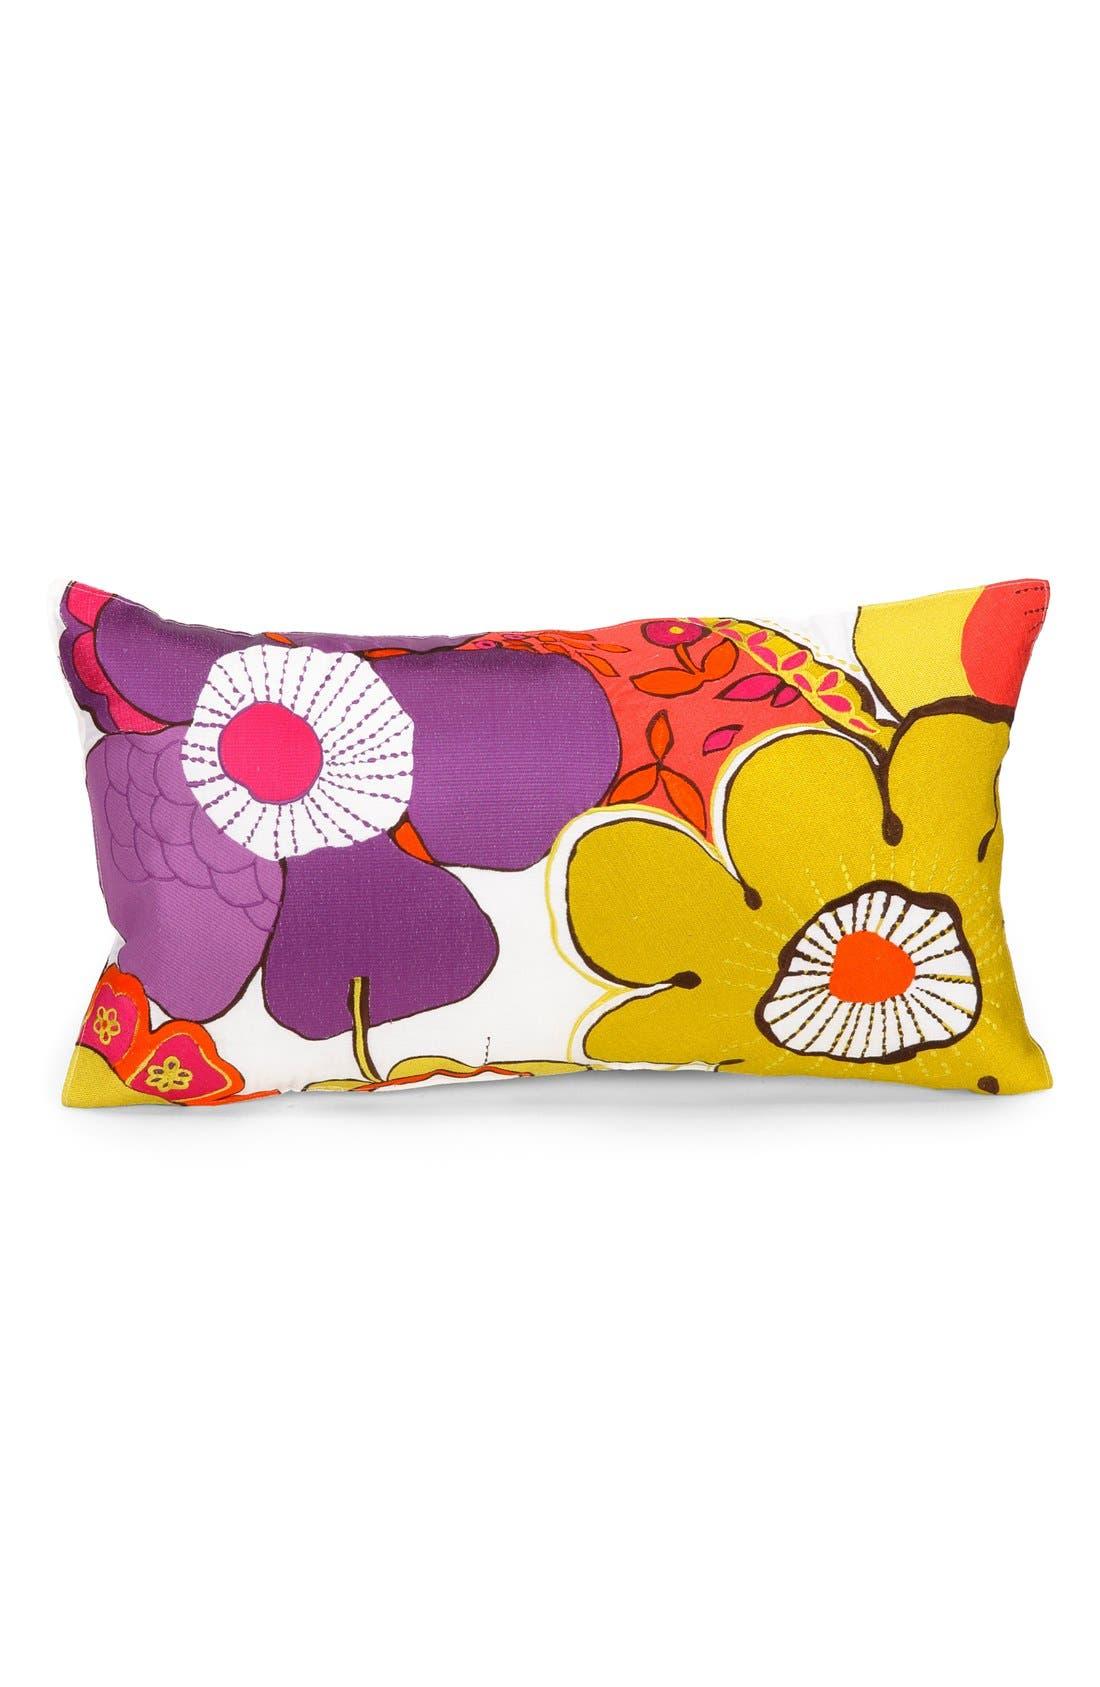 'Santorini' Pillow,                         Main,                         color, White